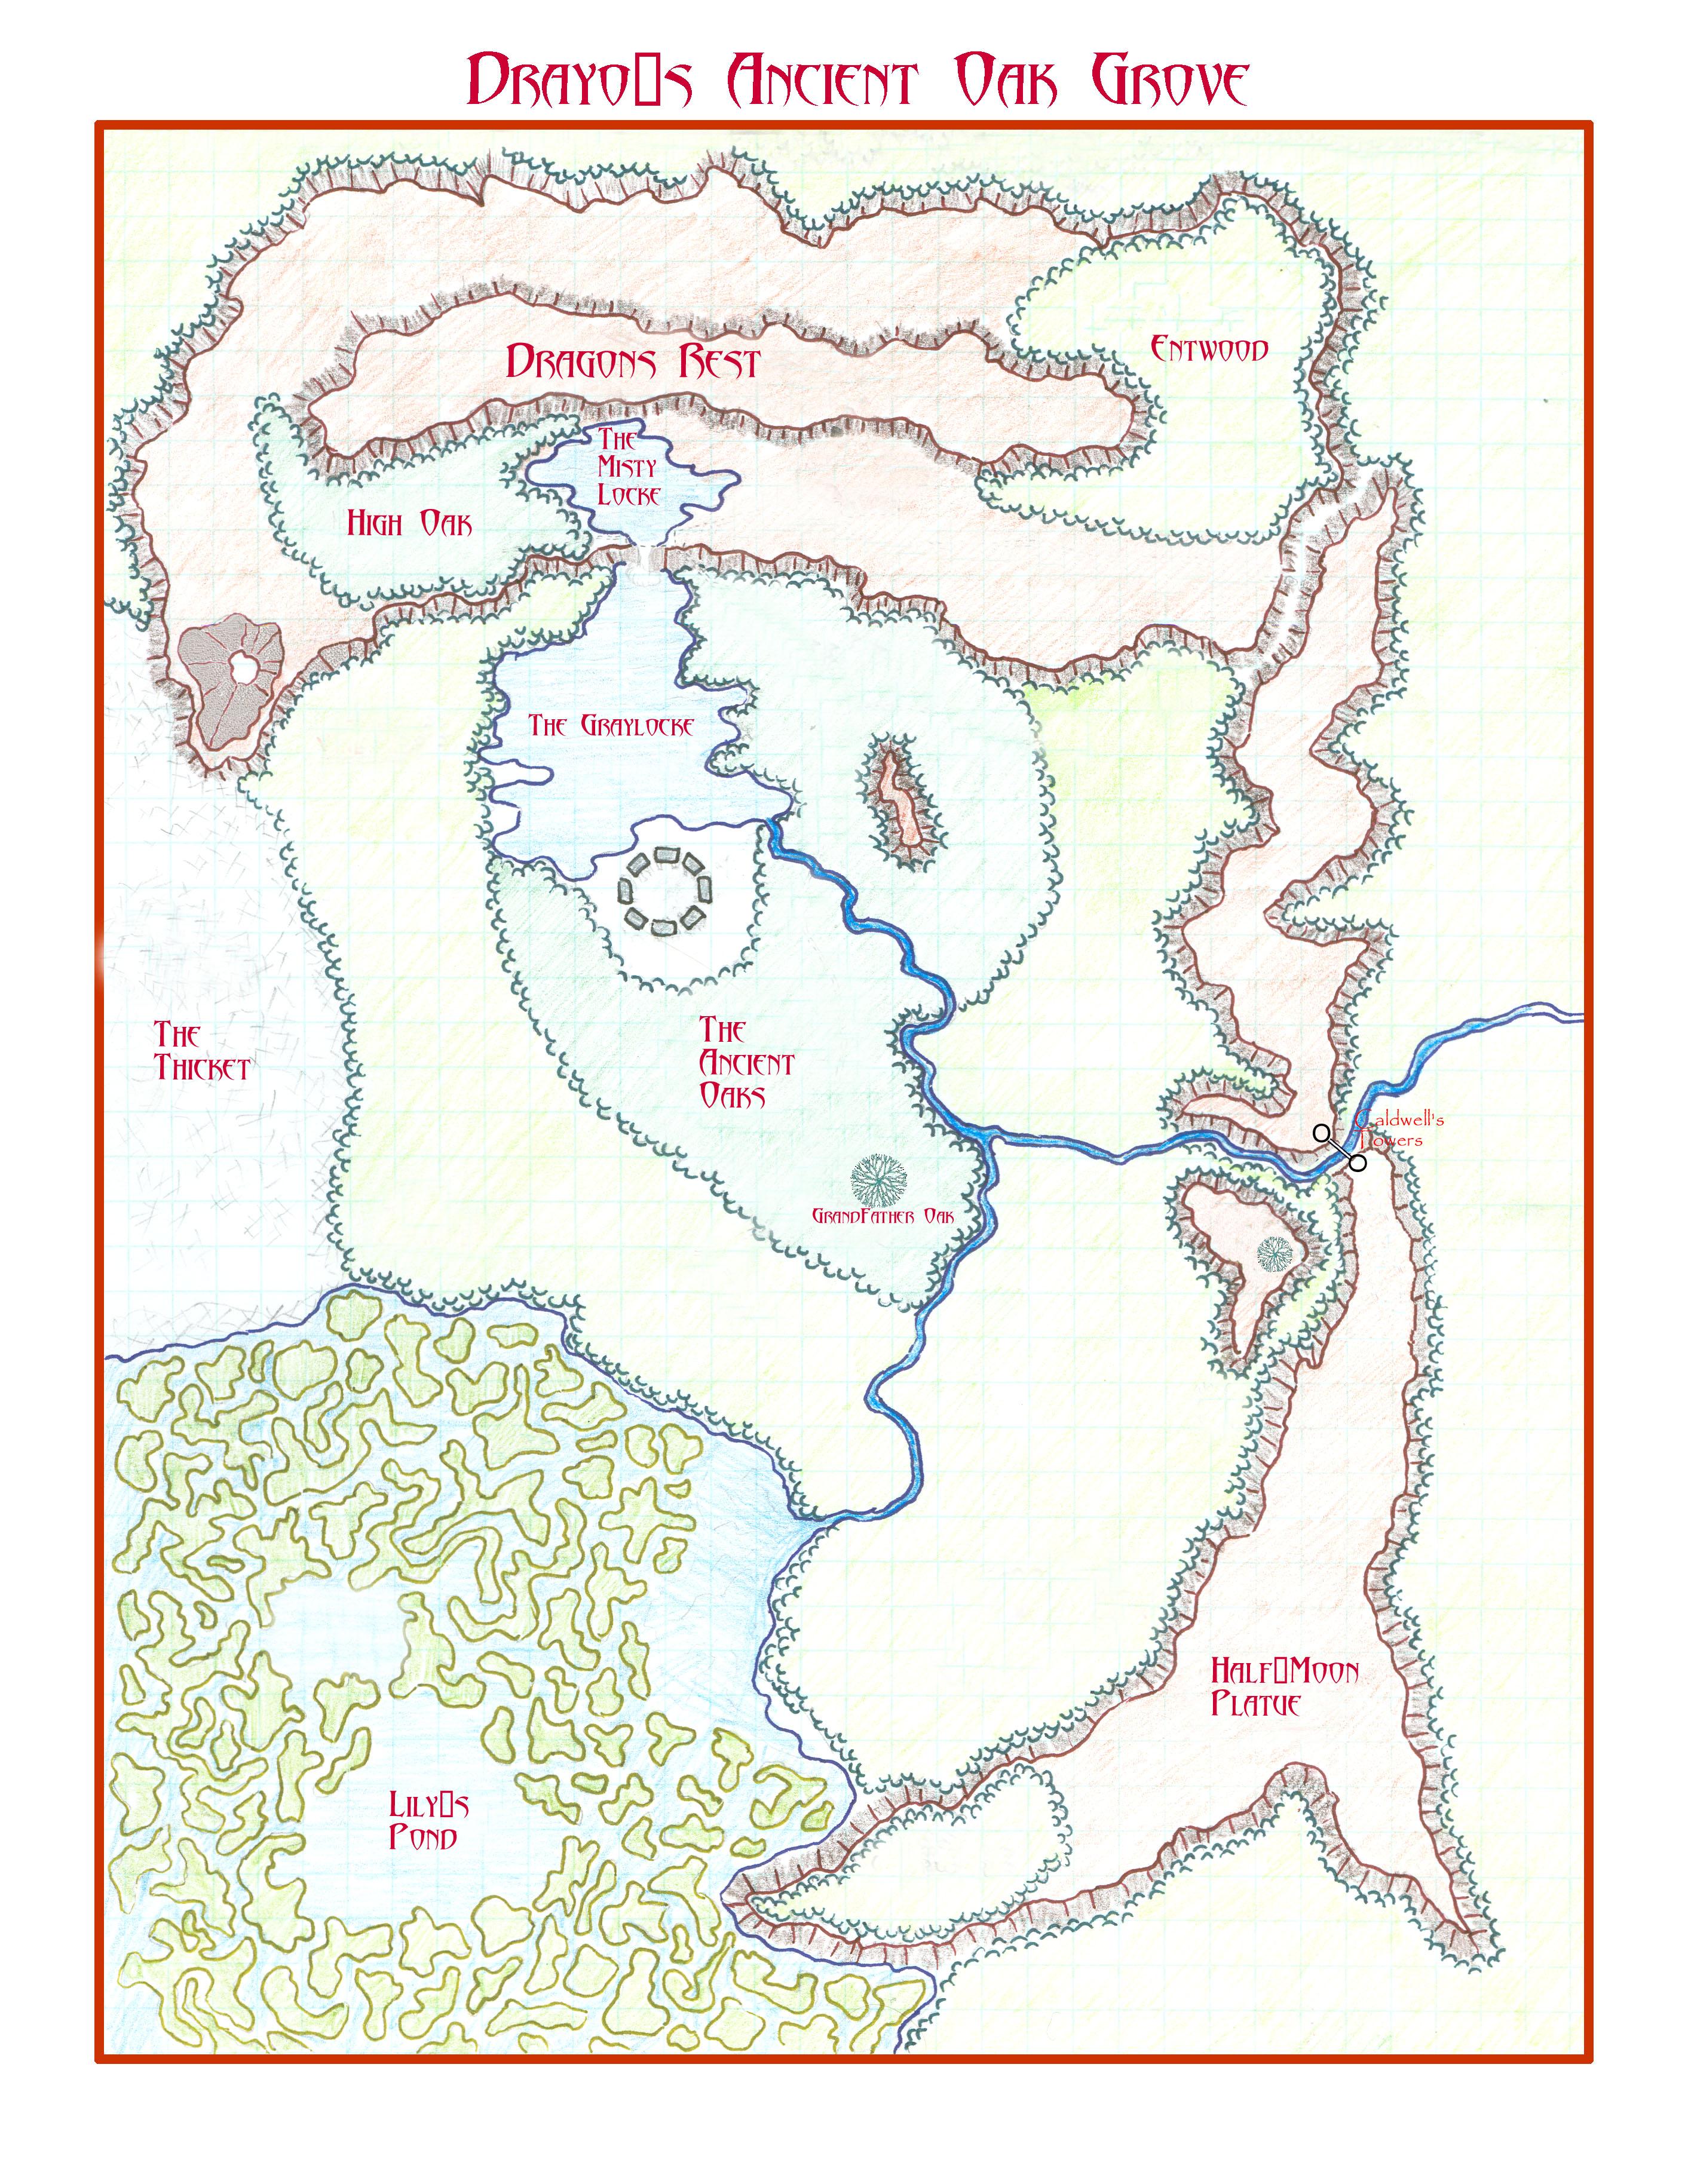 drayos grove